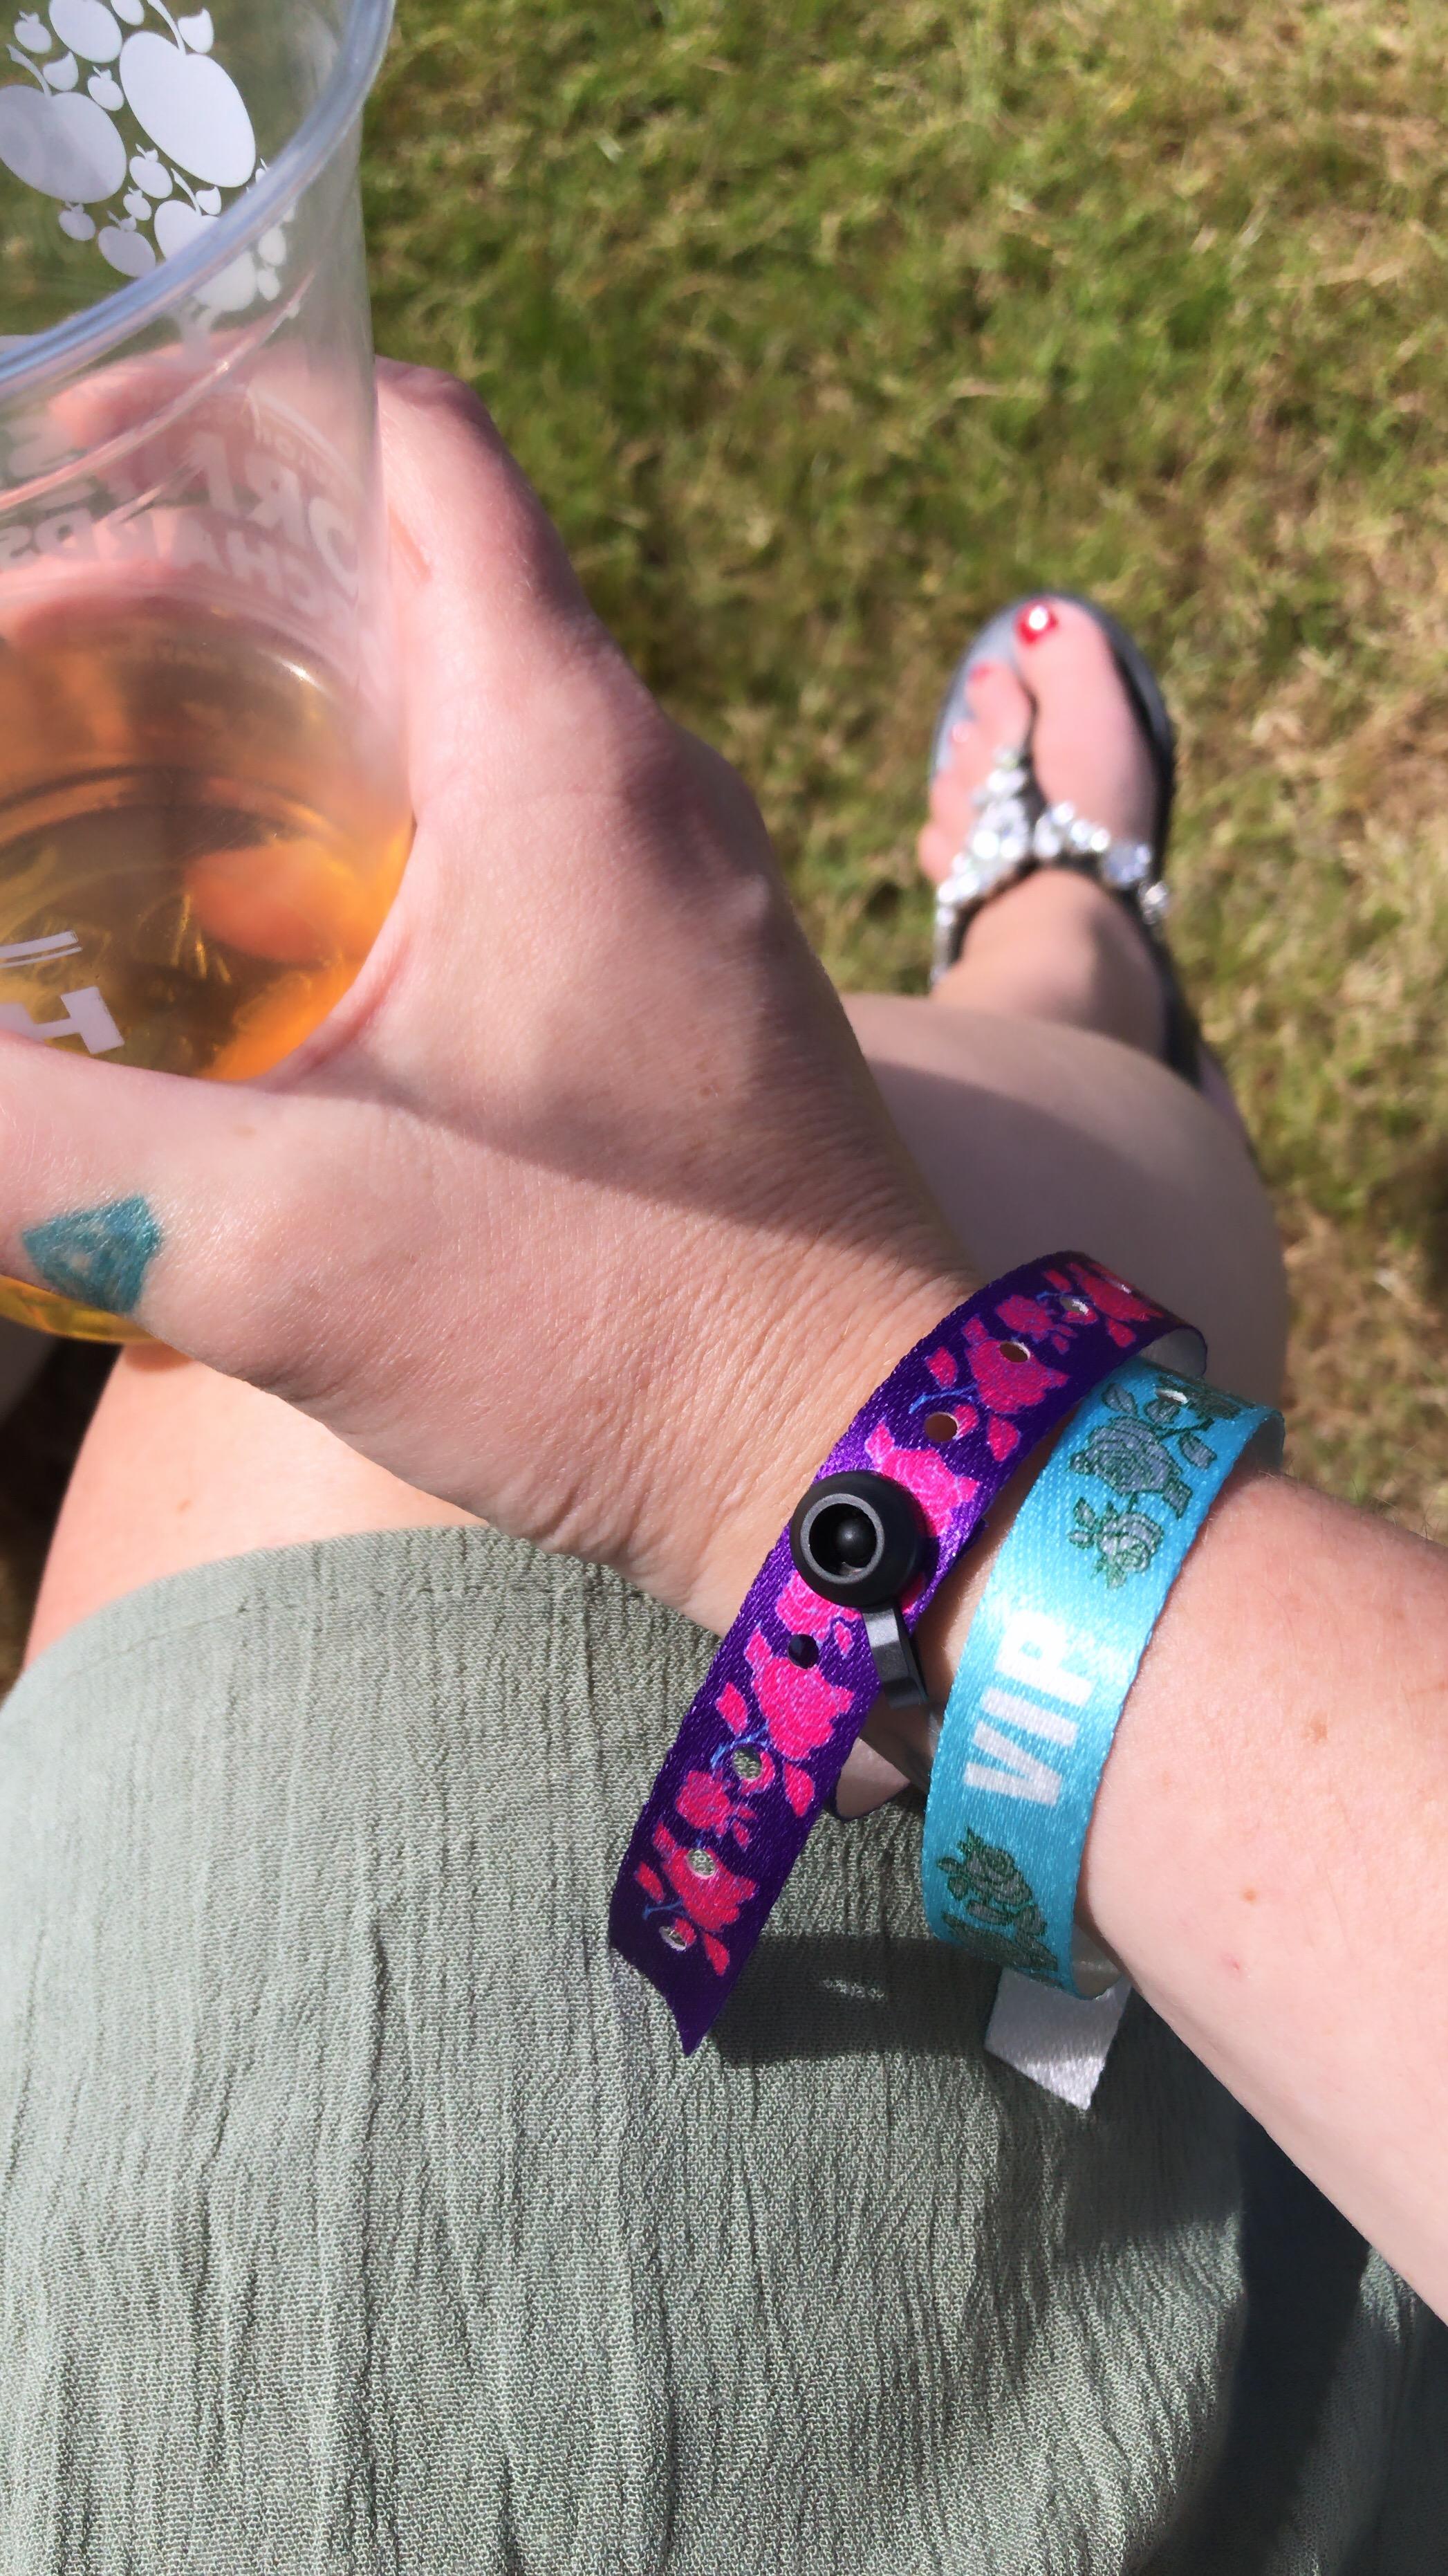 vipmusicfestival